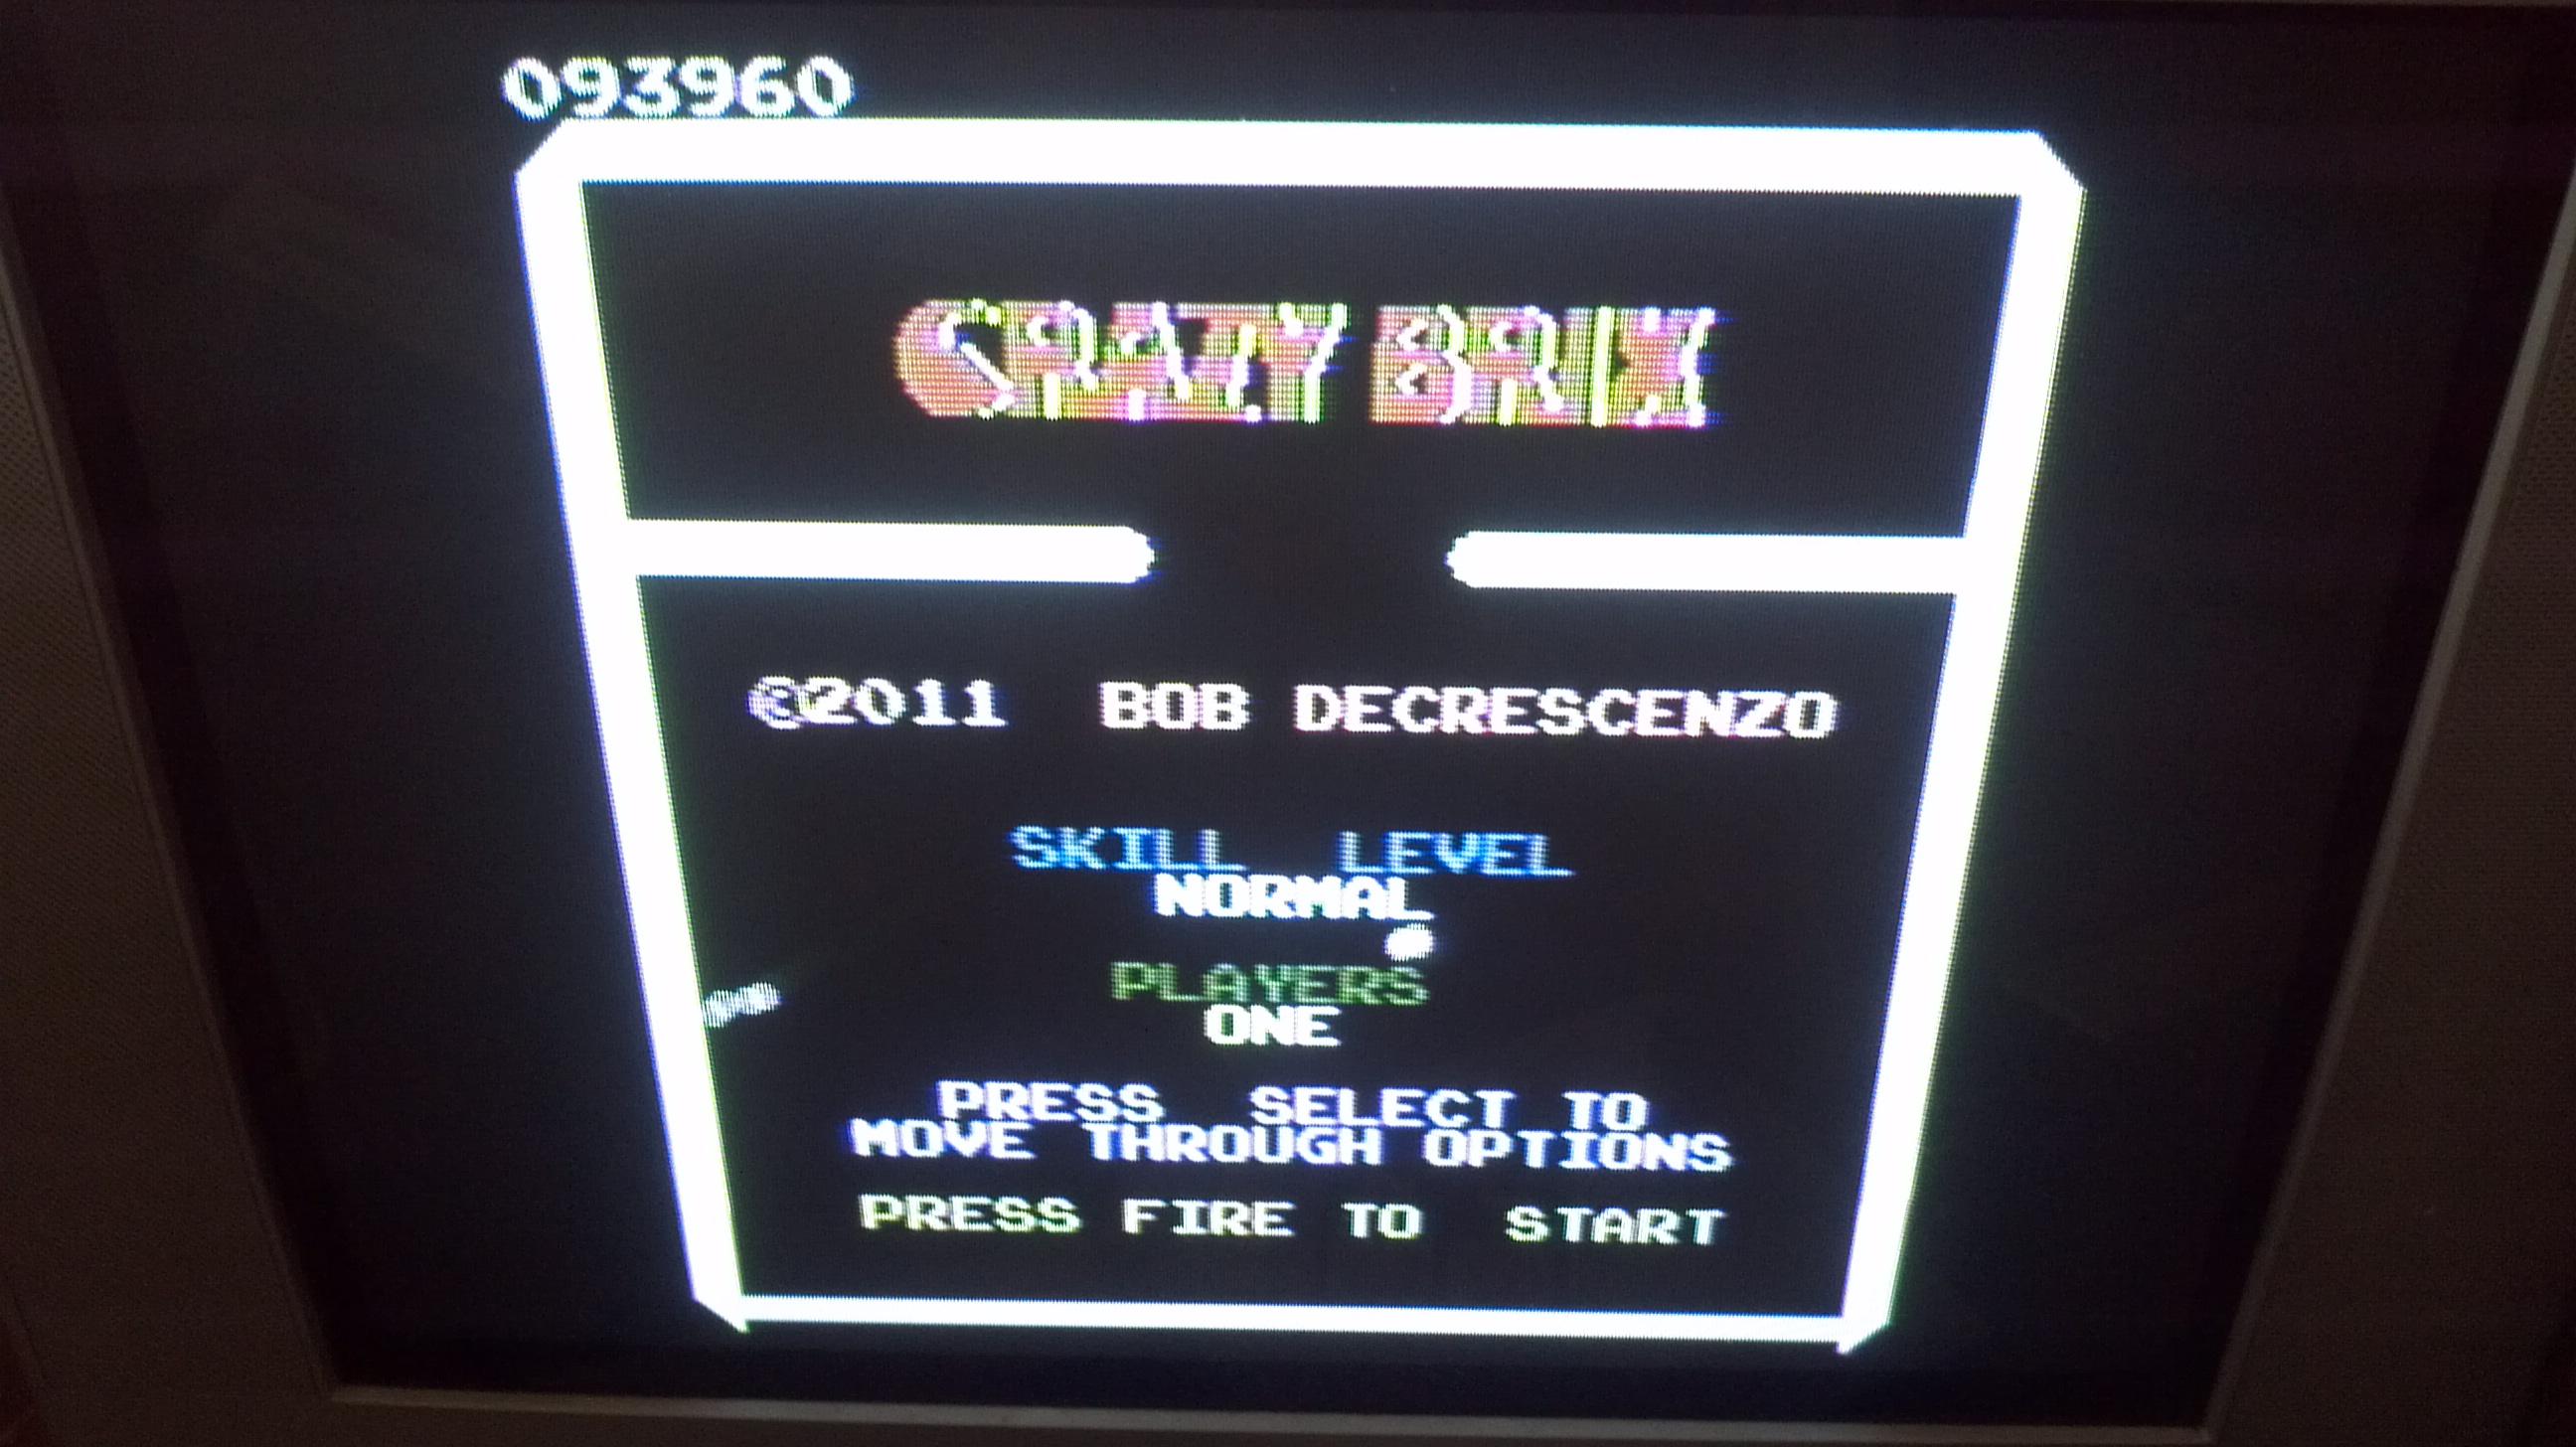 Crazy Brix: Normal 93,960 points